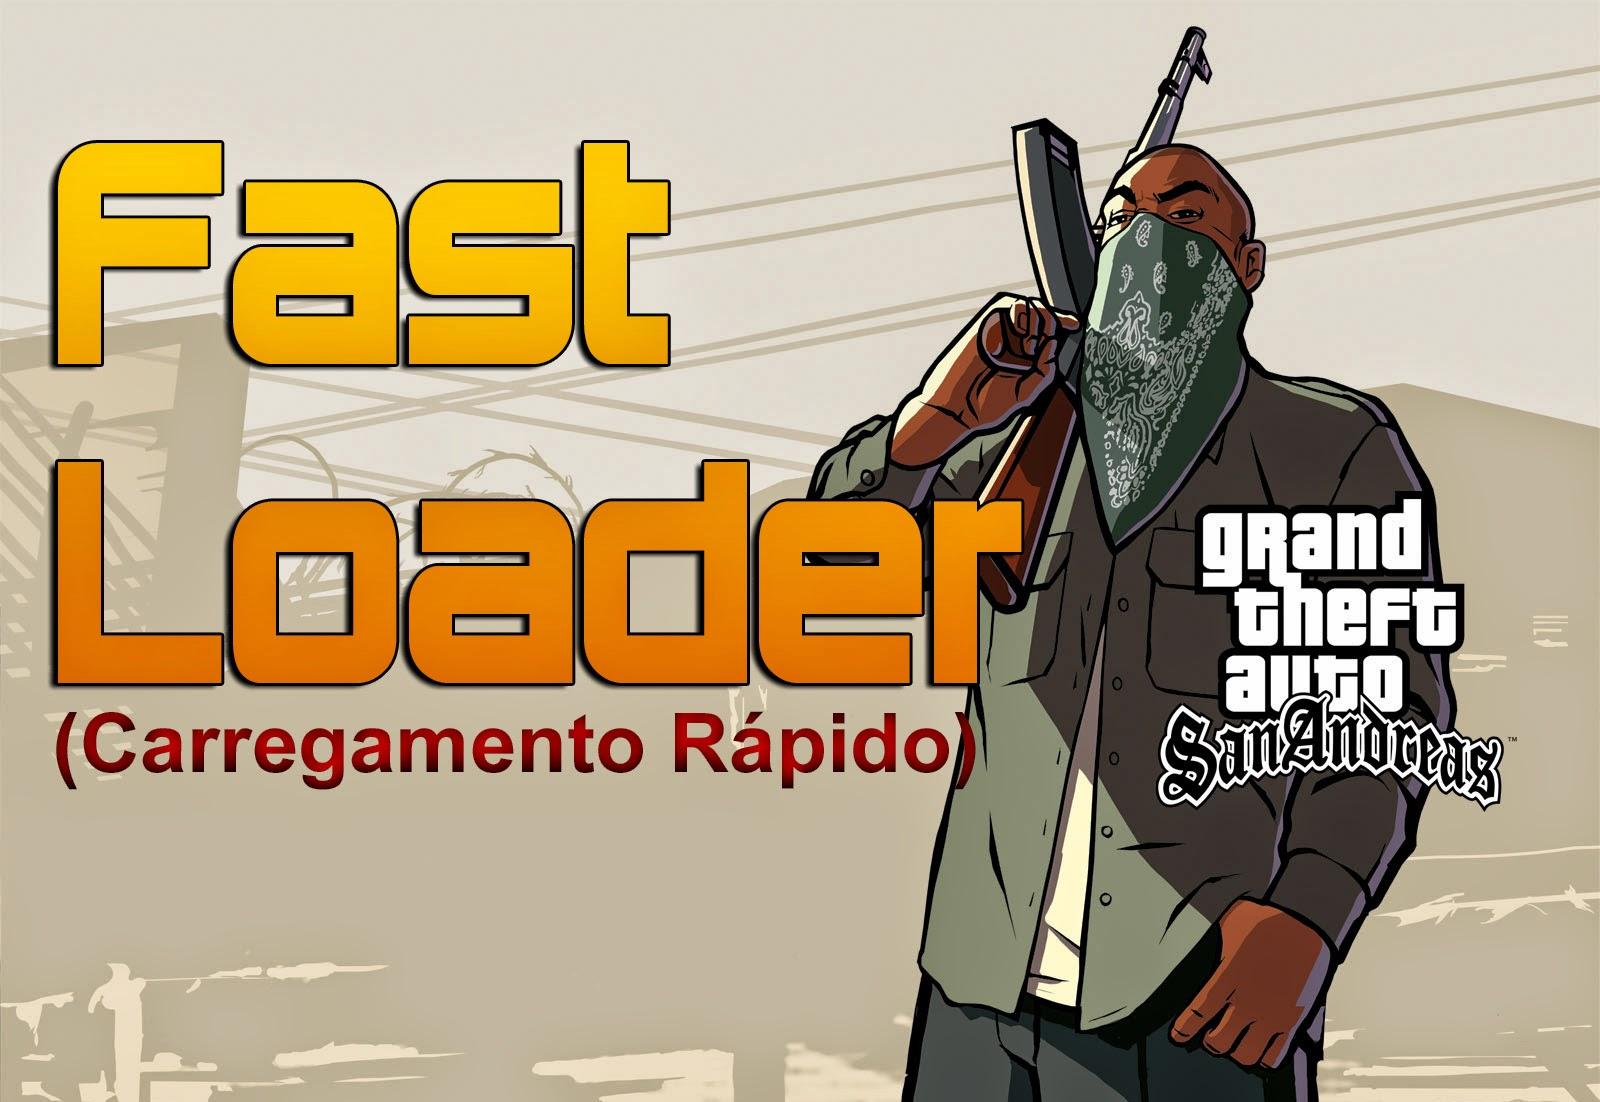 SA - Fast Loader (Carregamento Rápido)